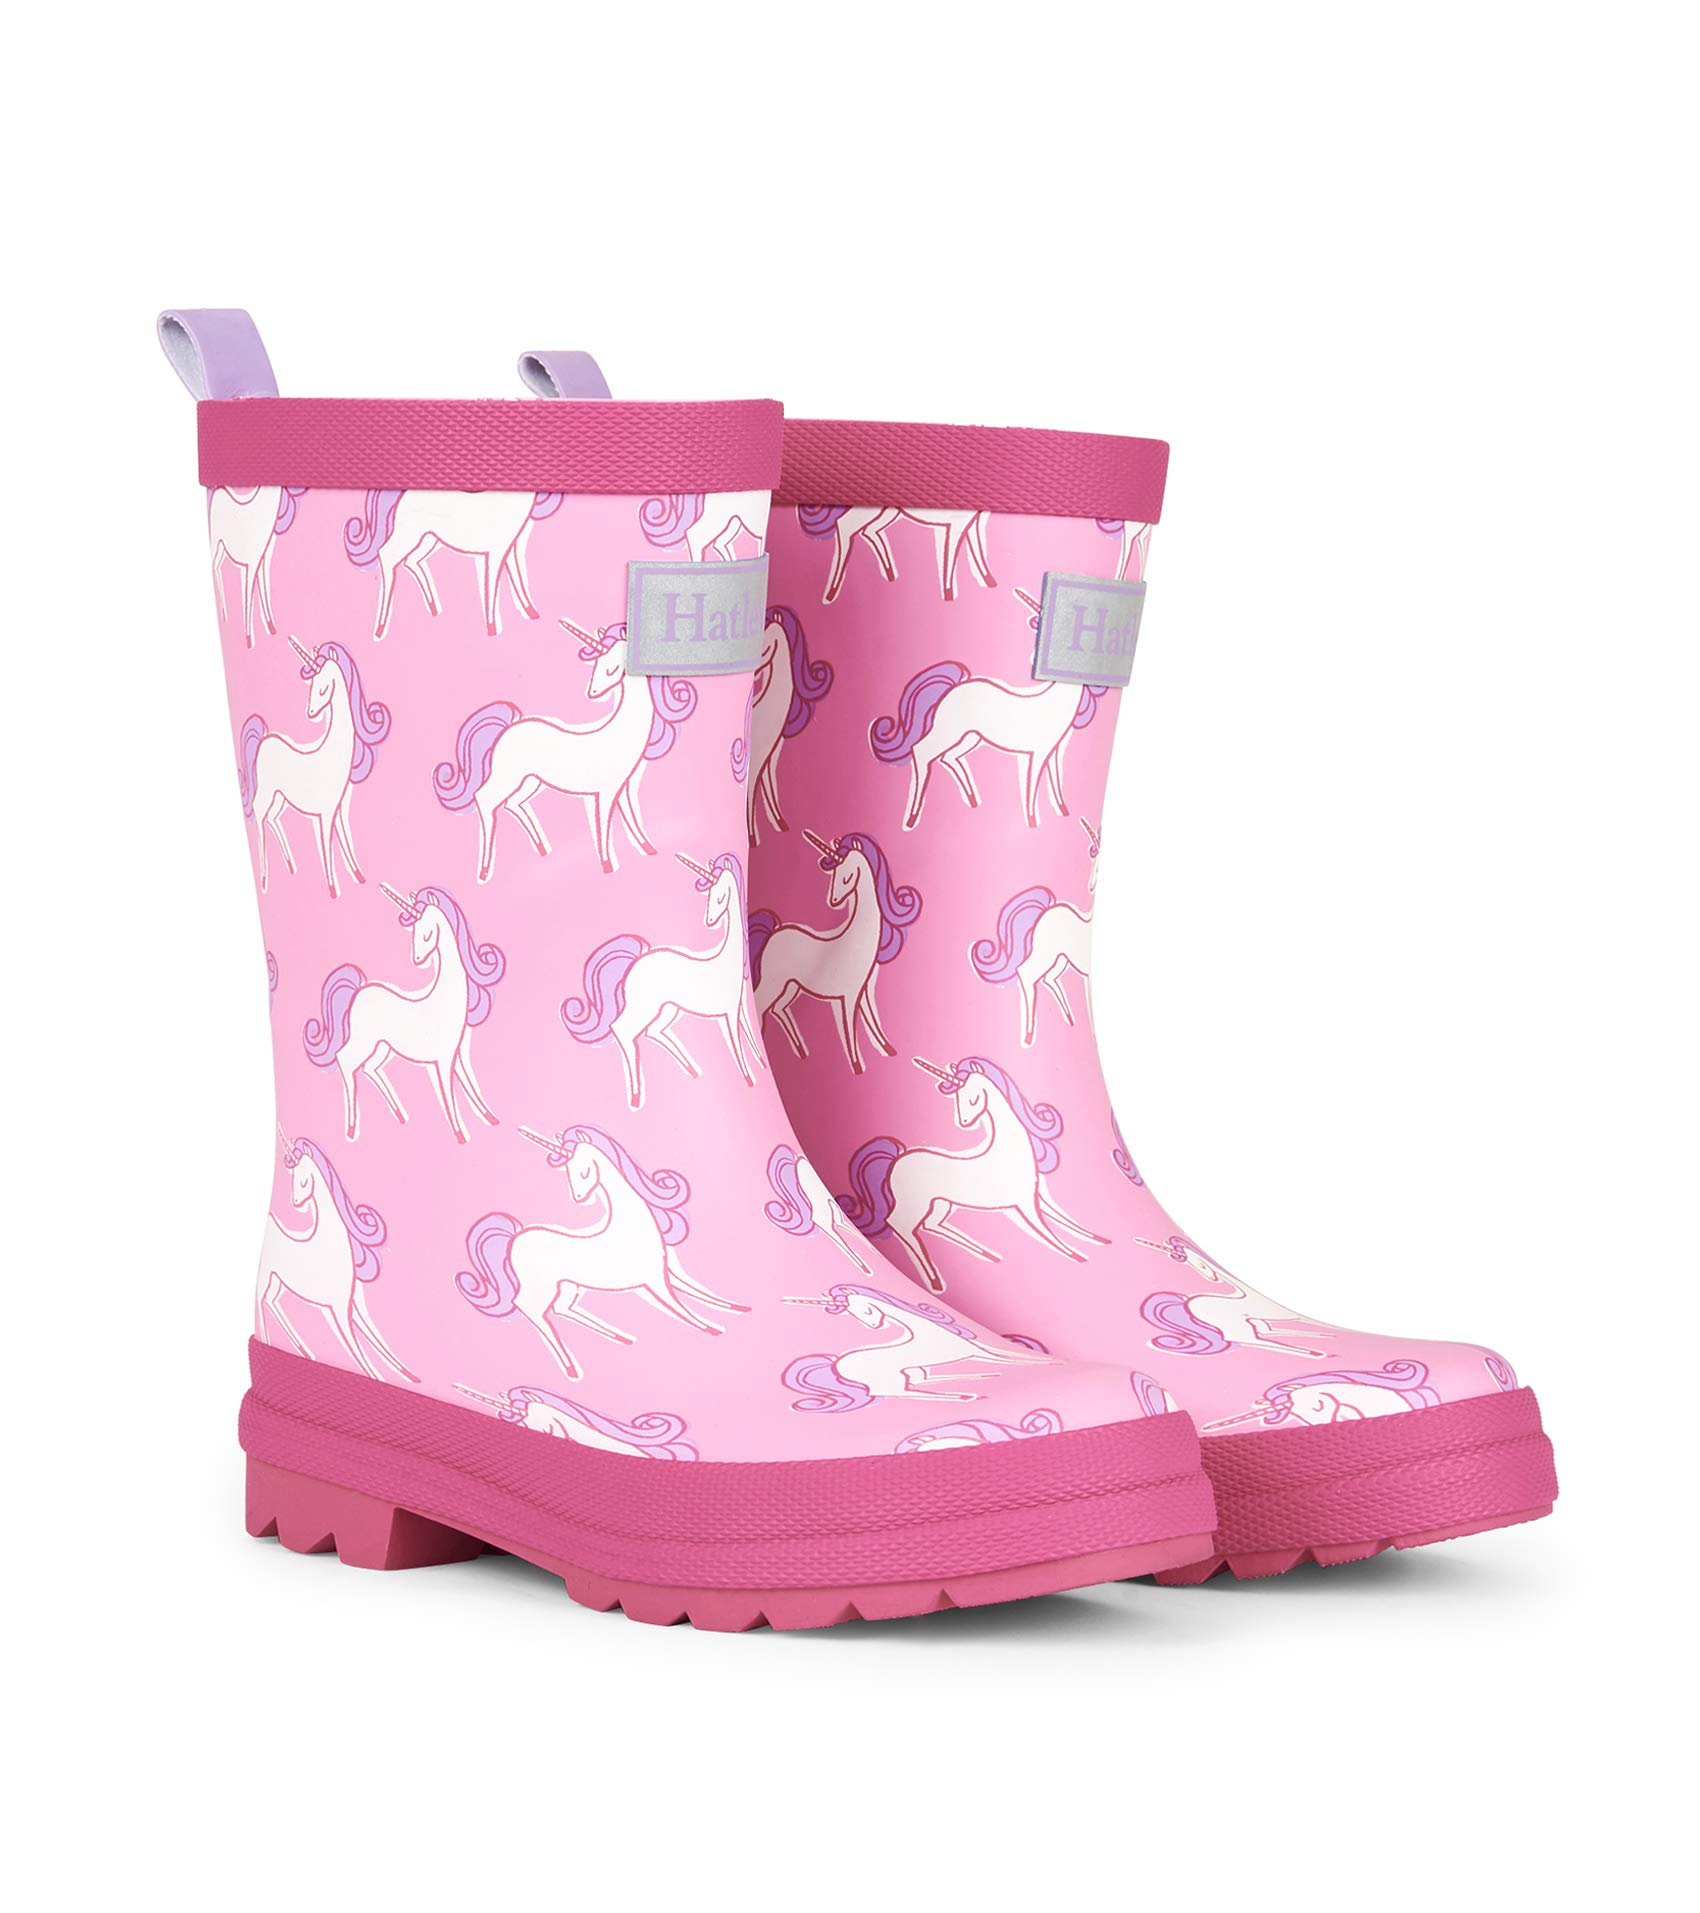 Hatley Girls' Little Printed Rain Boots, Matte Unicorn Doodles, 11 US Child by Hatley